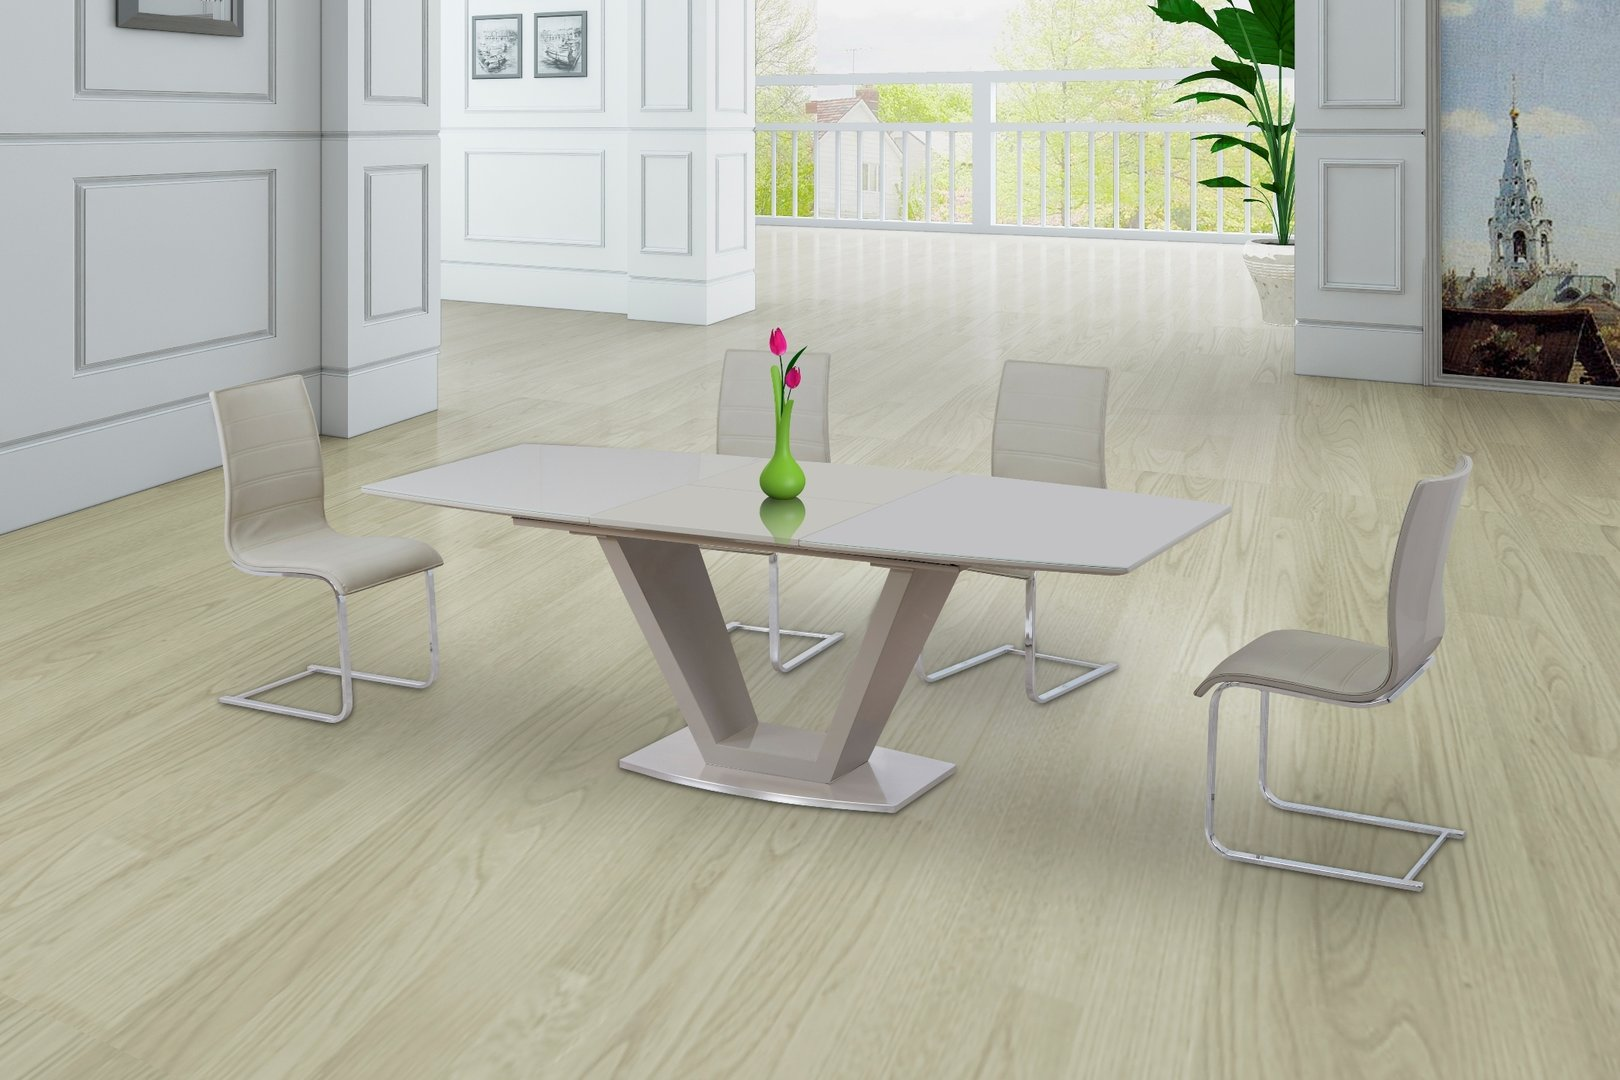 Cream glass high gloss extending dining table and 6 gloss for Cream dining room table and chairs